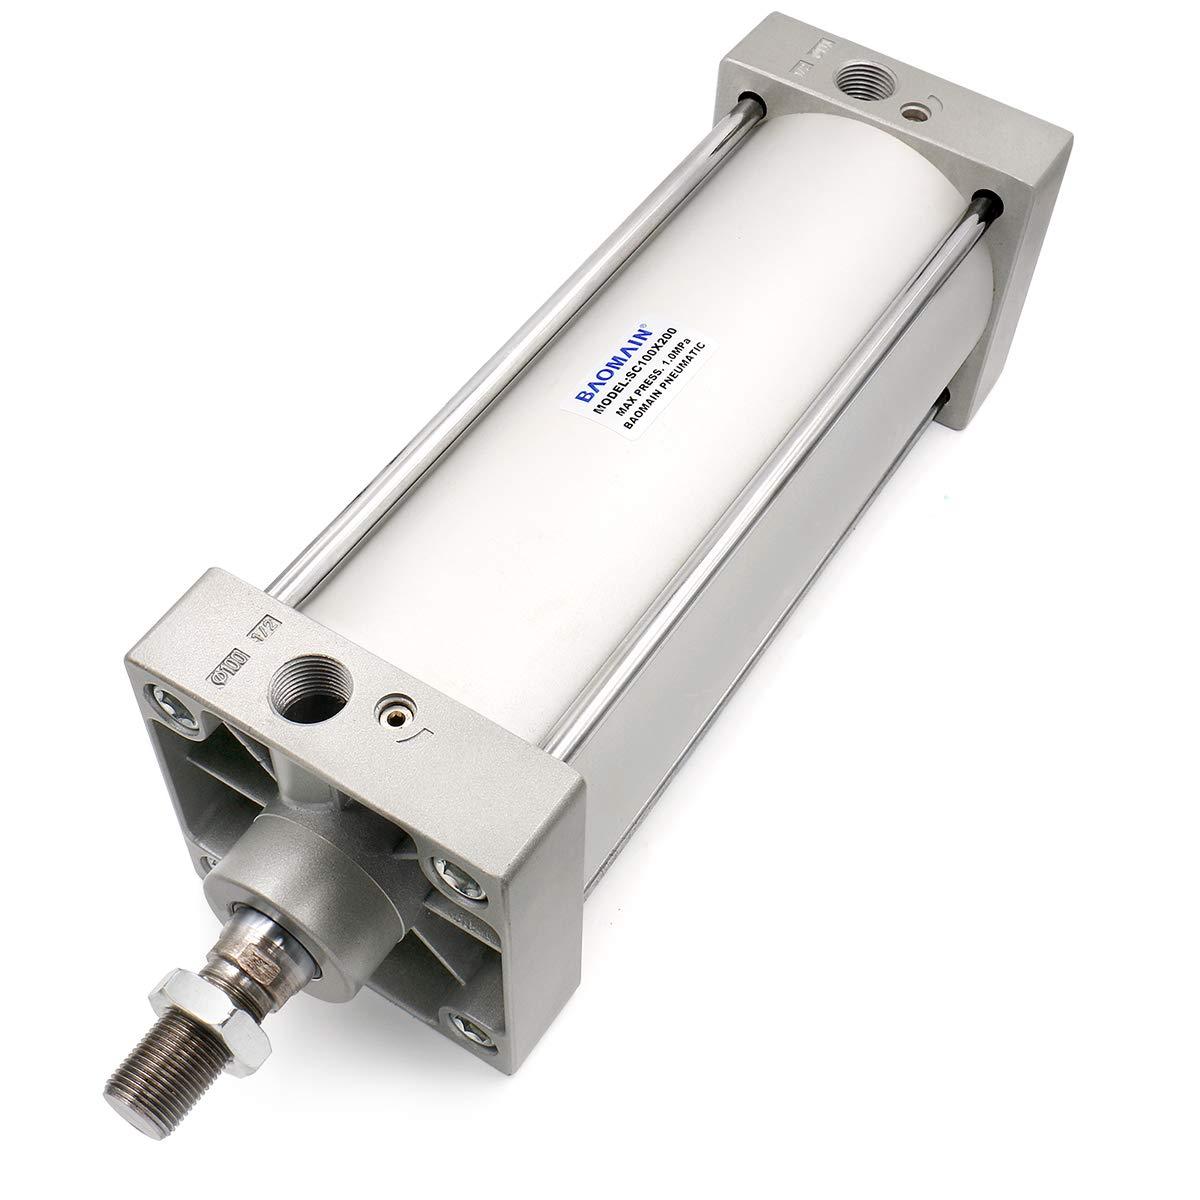 Baomain Pneumatic Air Cylinder SC 100 x 200 PT1/2; Bore: 4